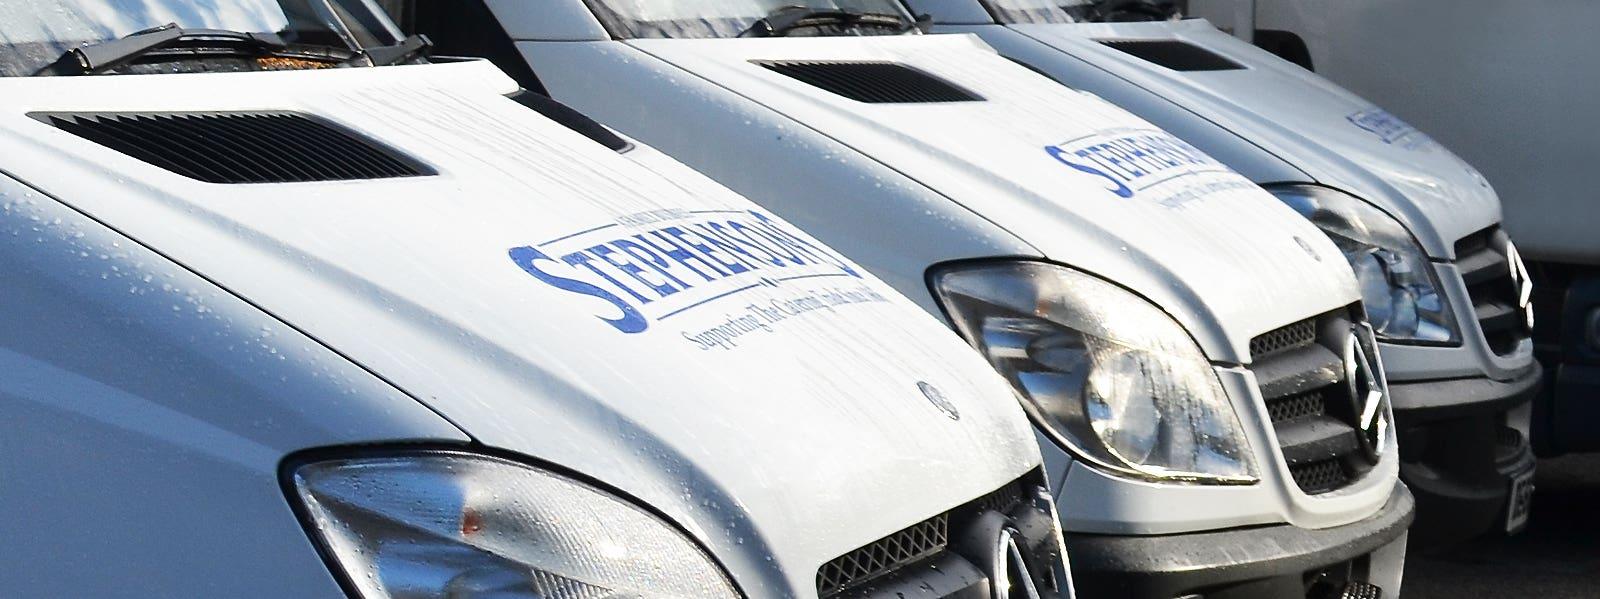 Stephensons maintain a dedicated fleet of delivery vans